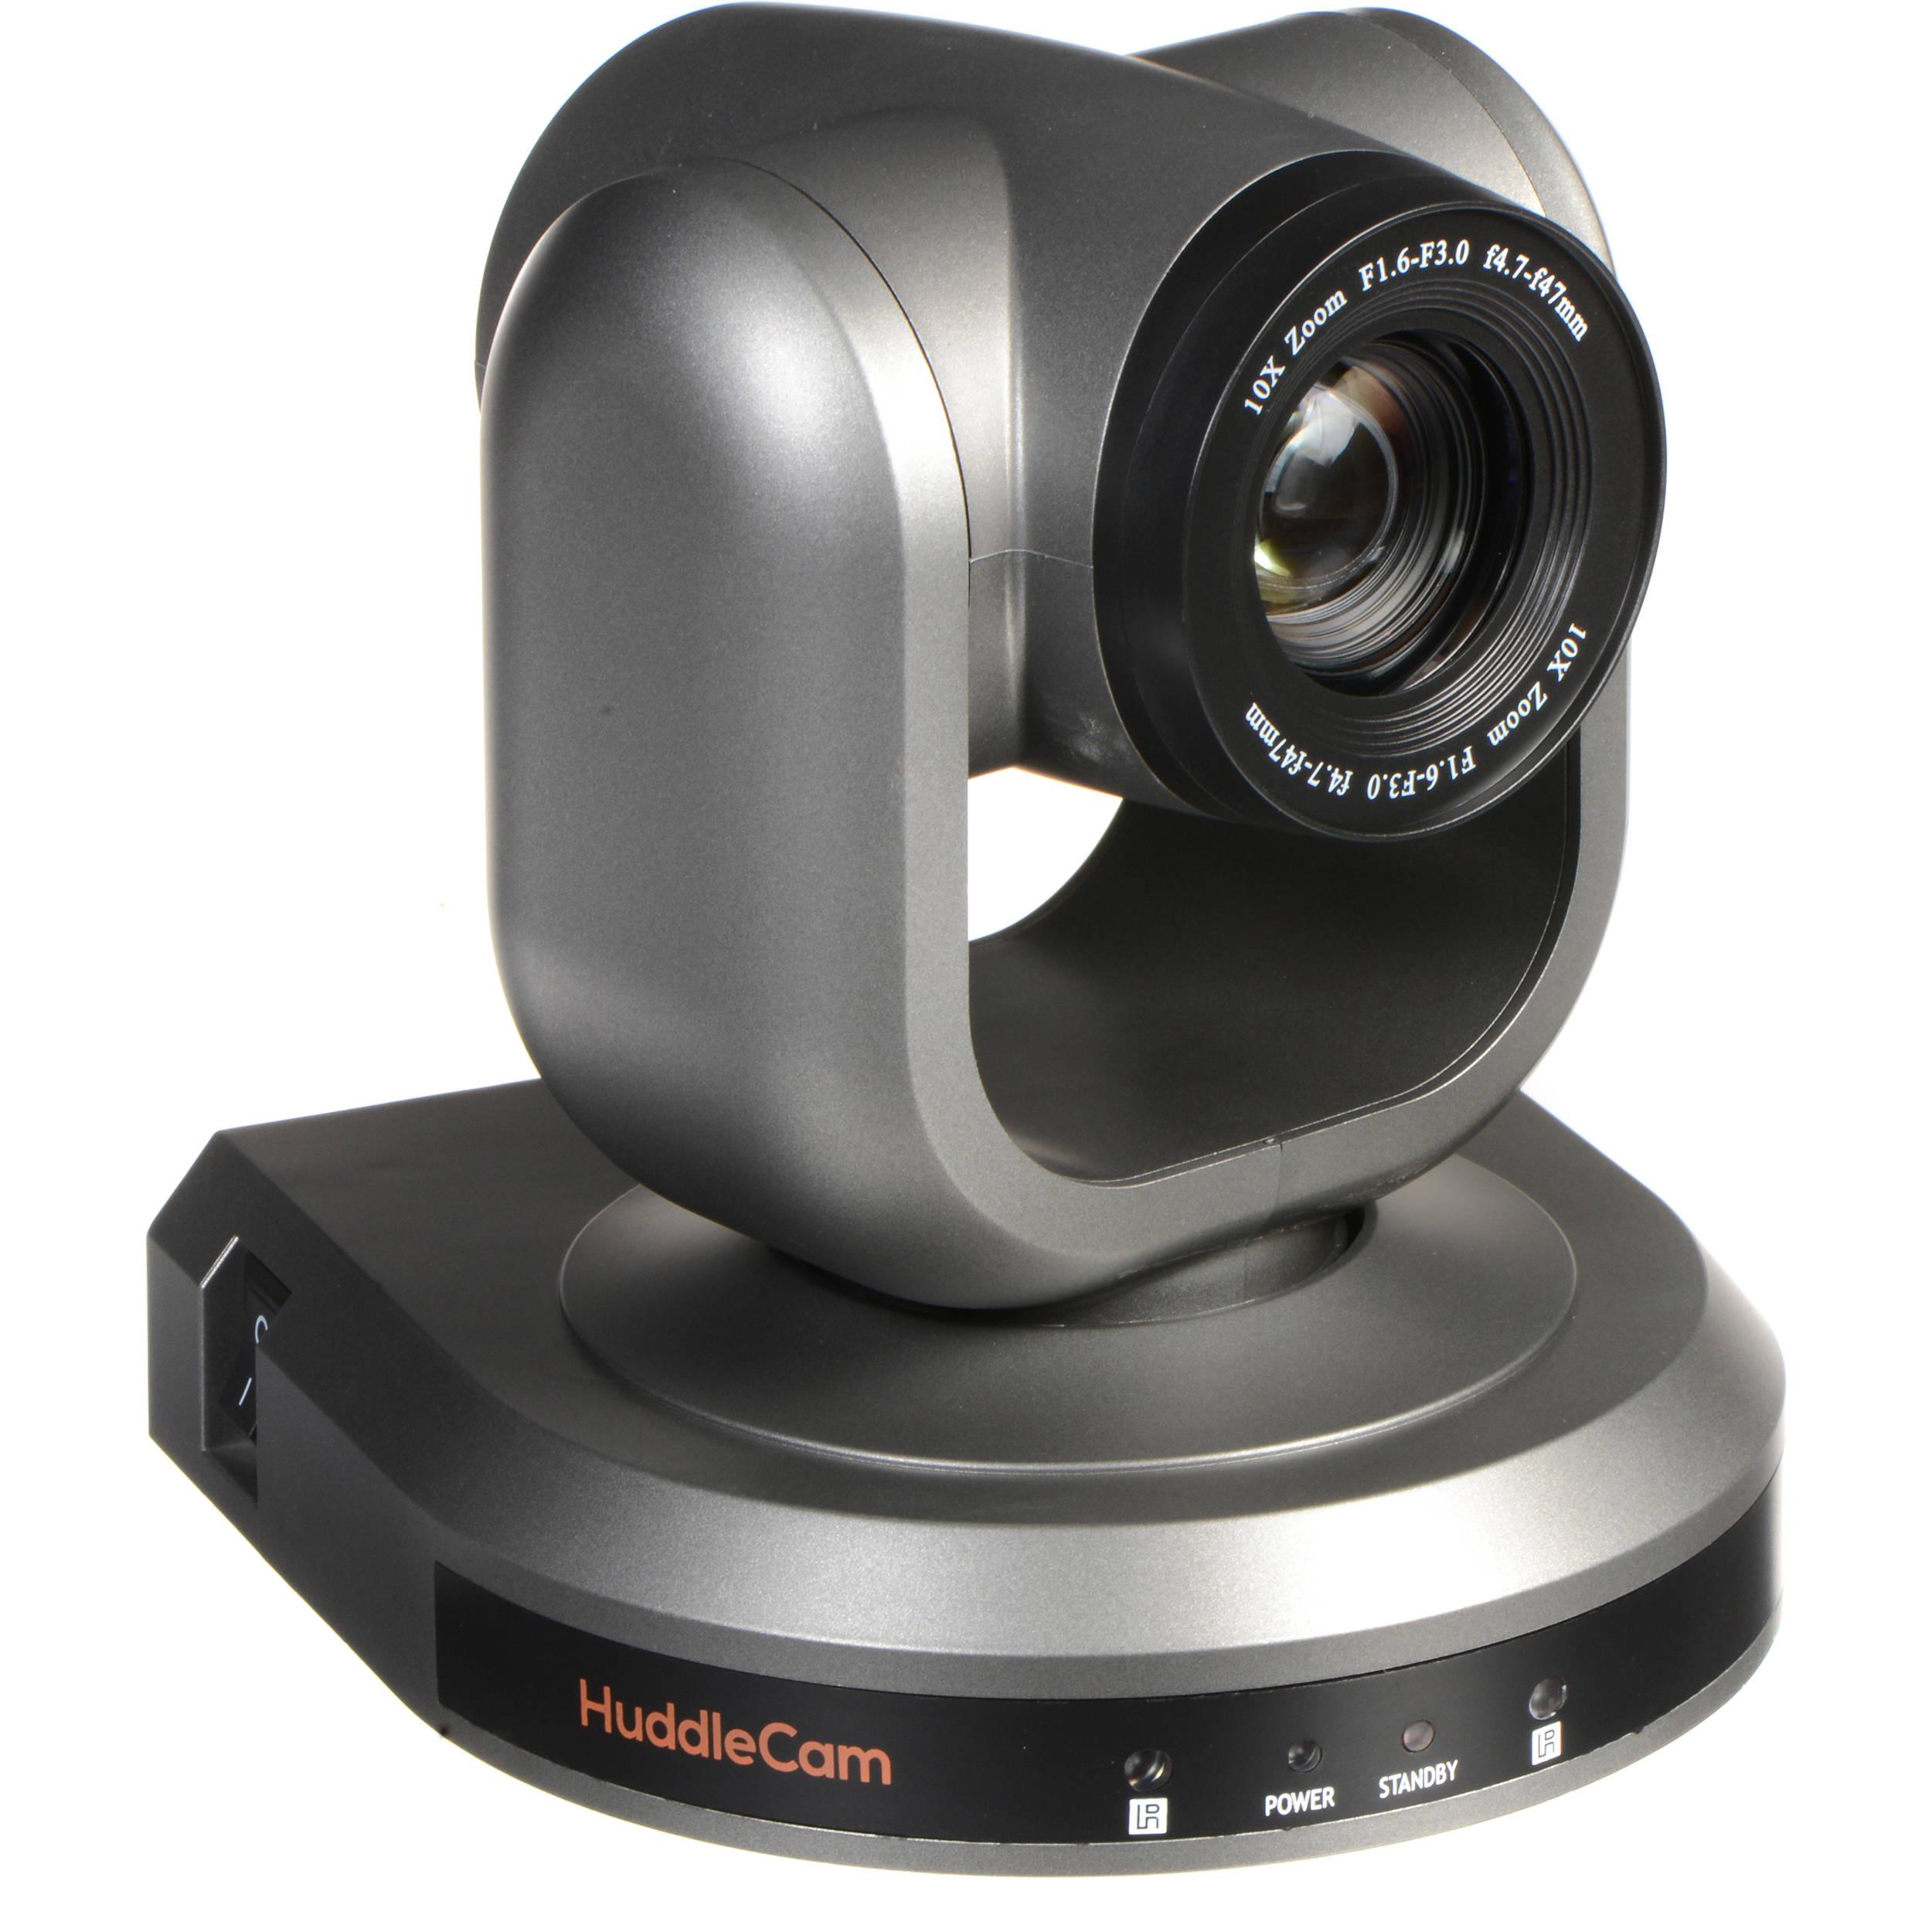 HuddleCamHD 10X-GY-G3 PTZ Camera (Gray) HC10X-GY-G3 B&H Photo